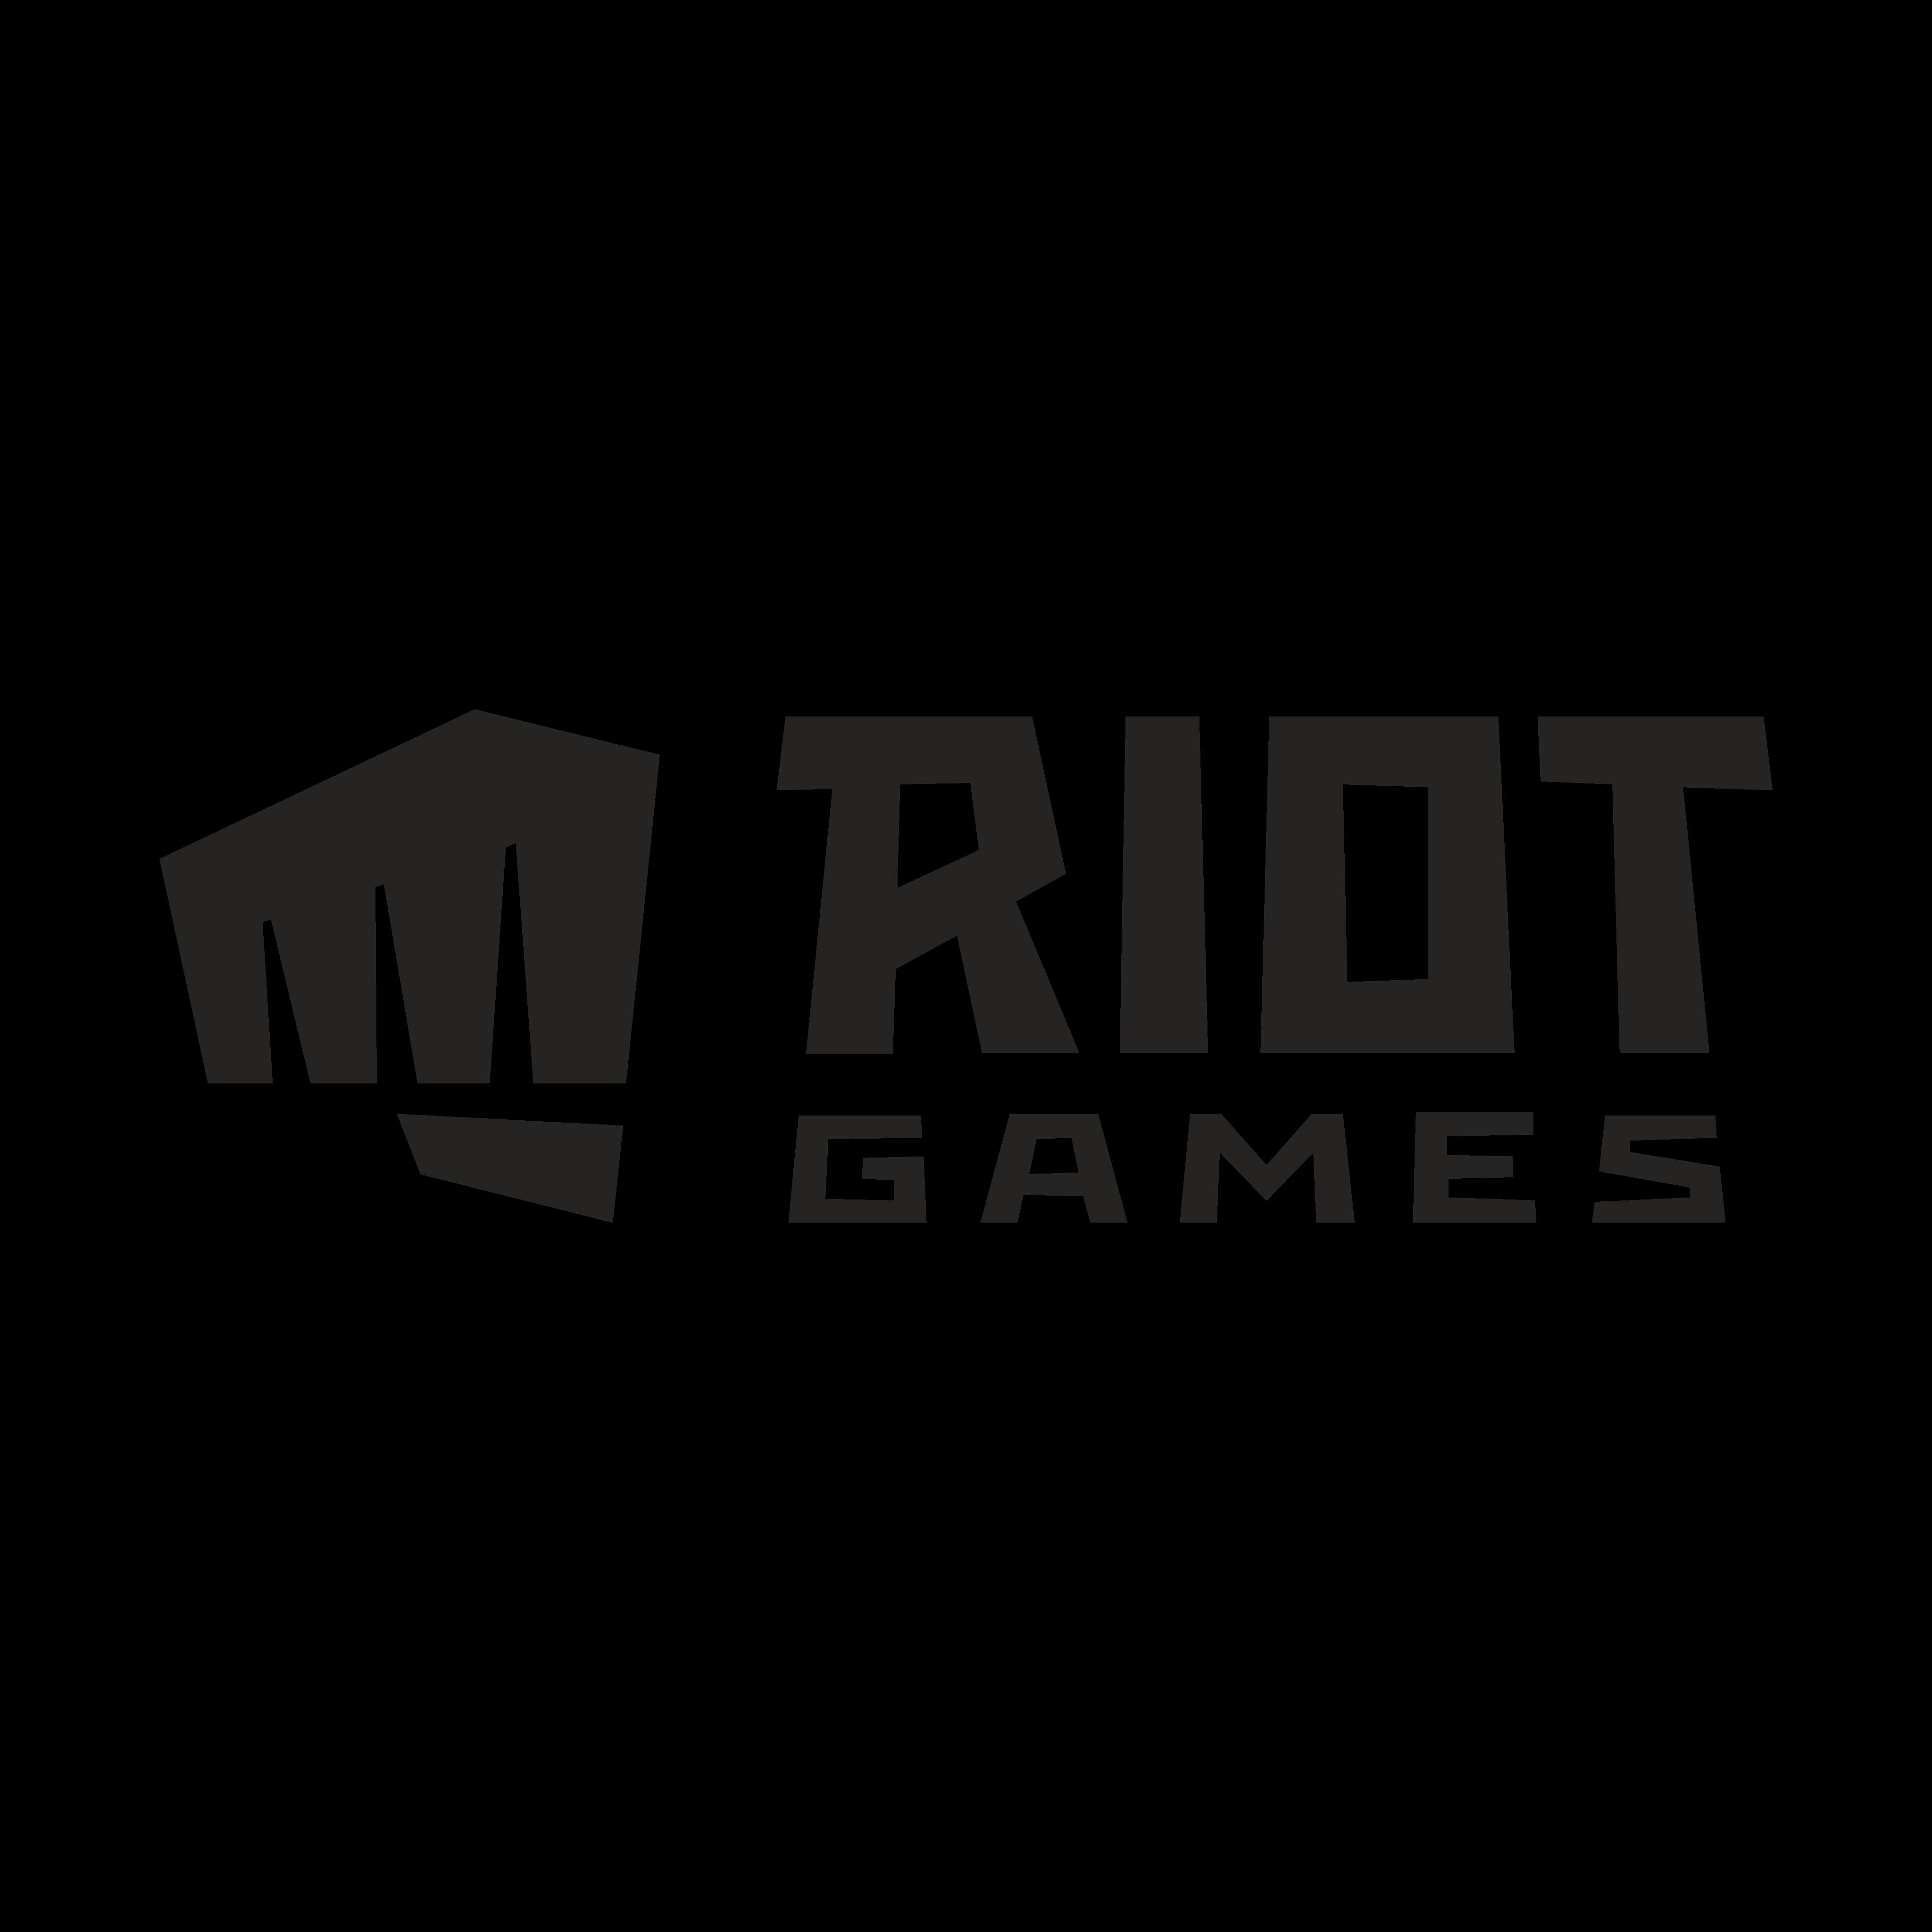 riot games logo 0 - Riot Games Logo